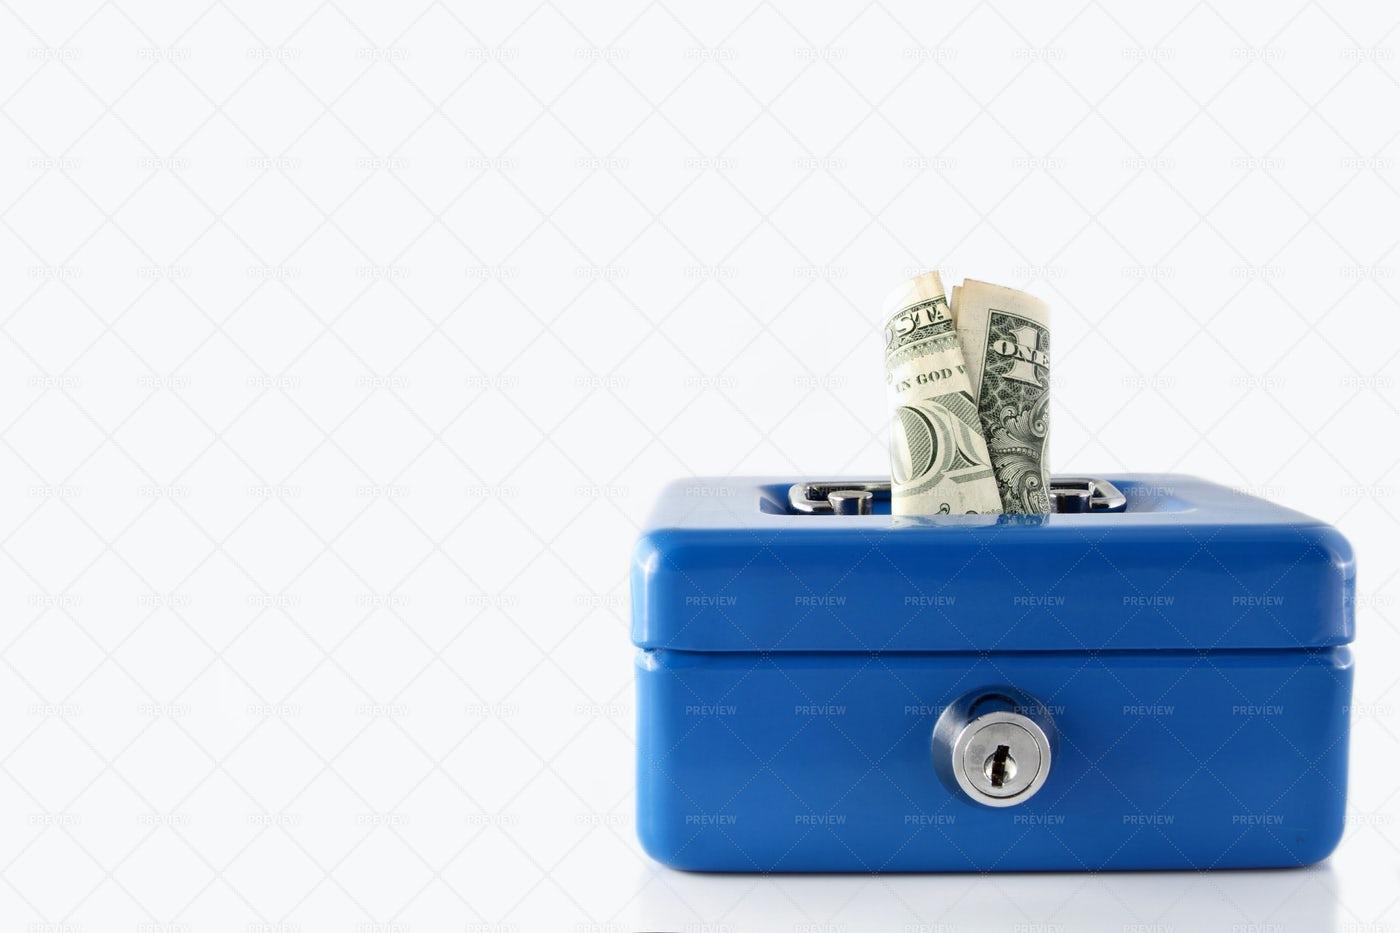 Blue Cash Box With Money: Stock Photos